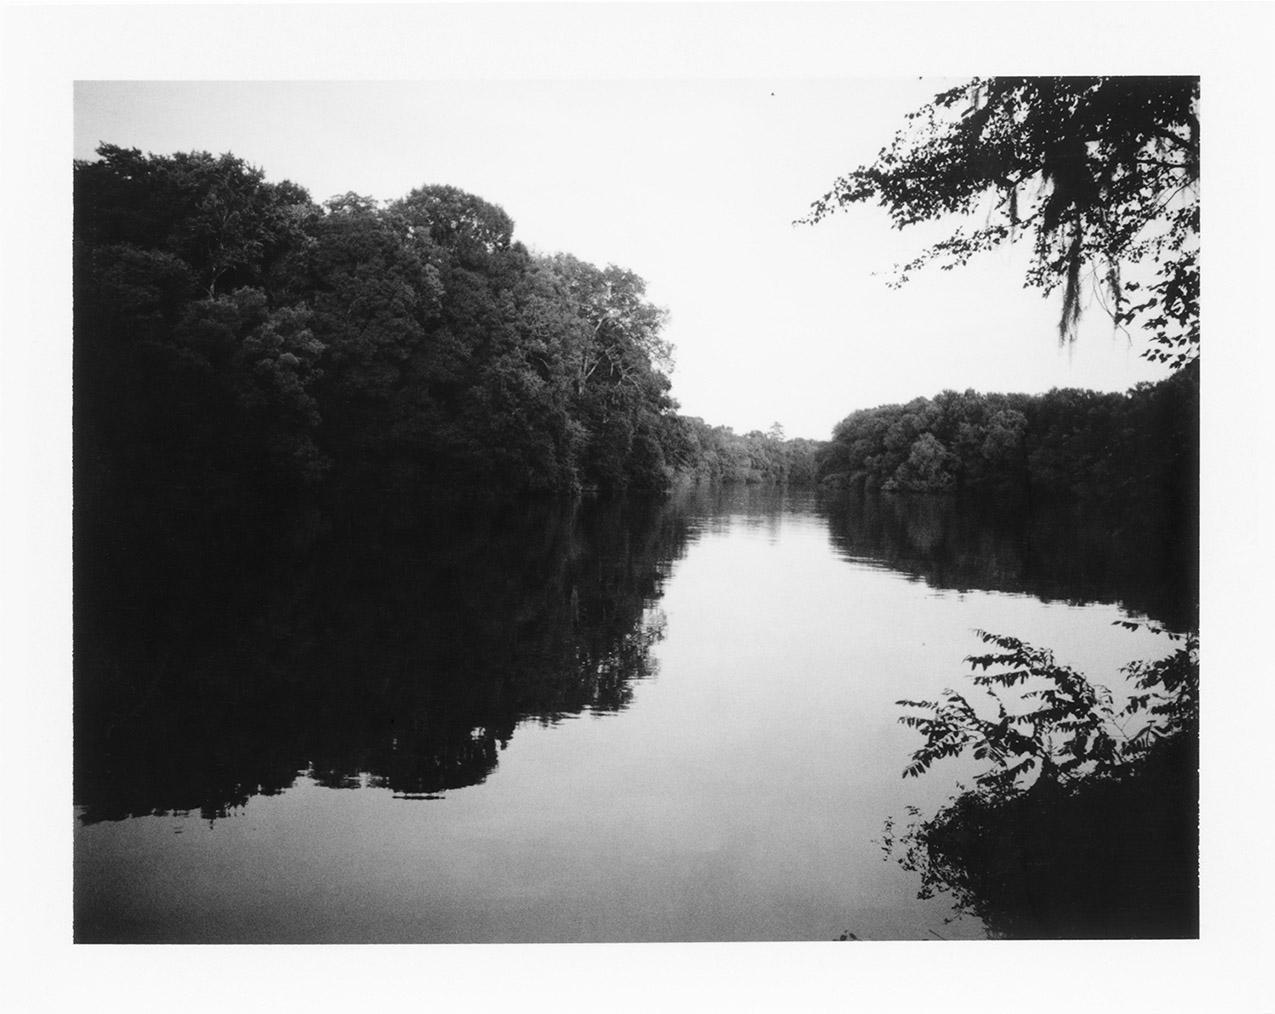 The River, Tanyard